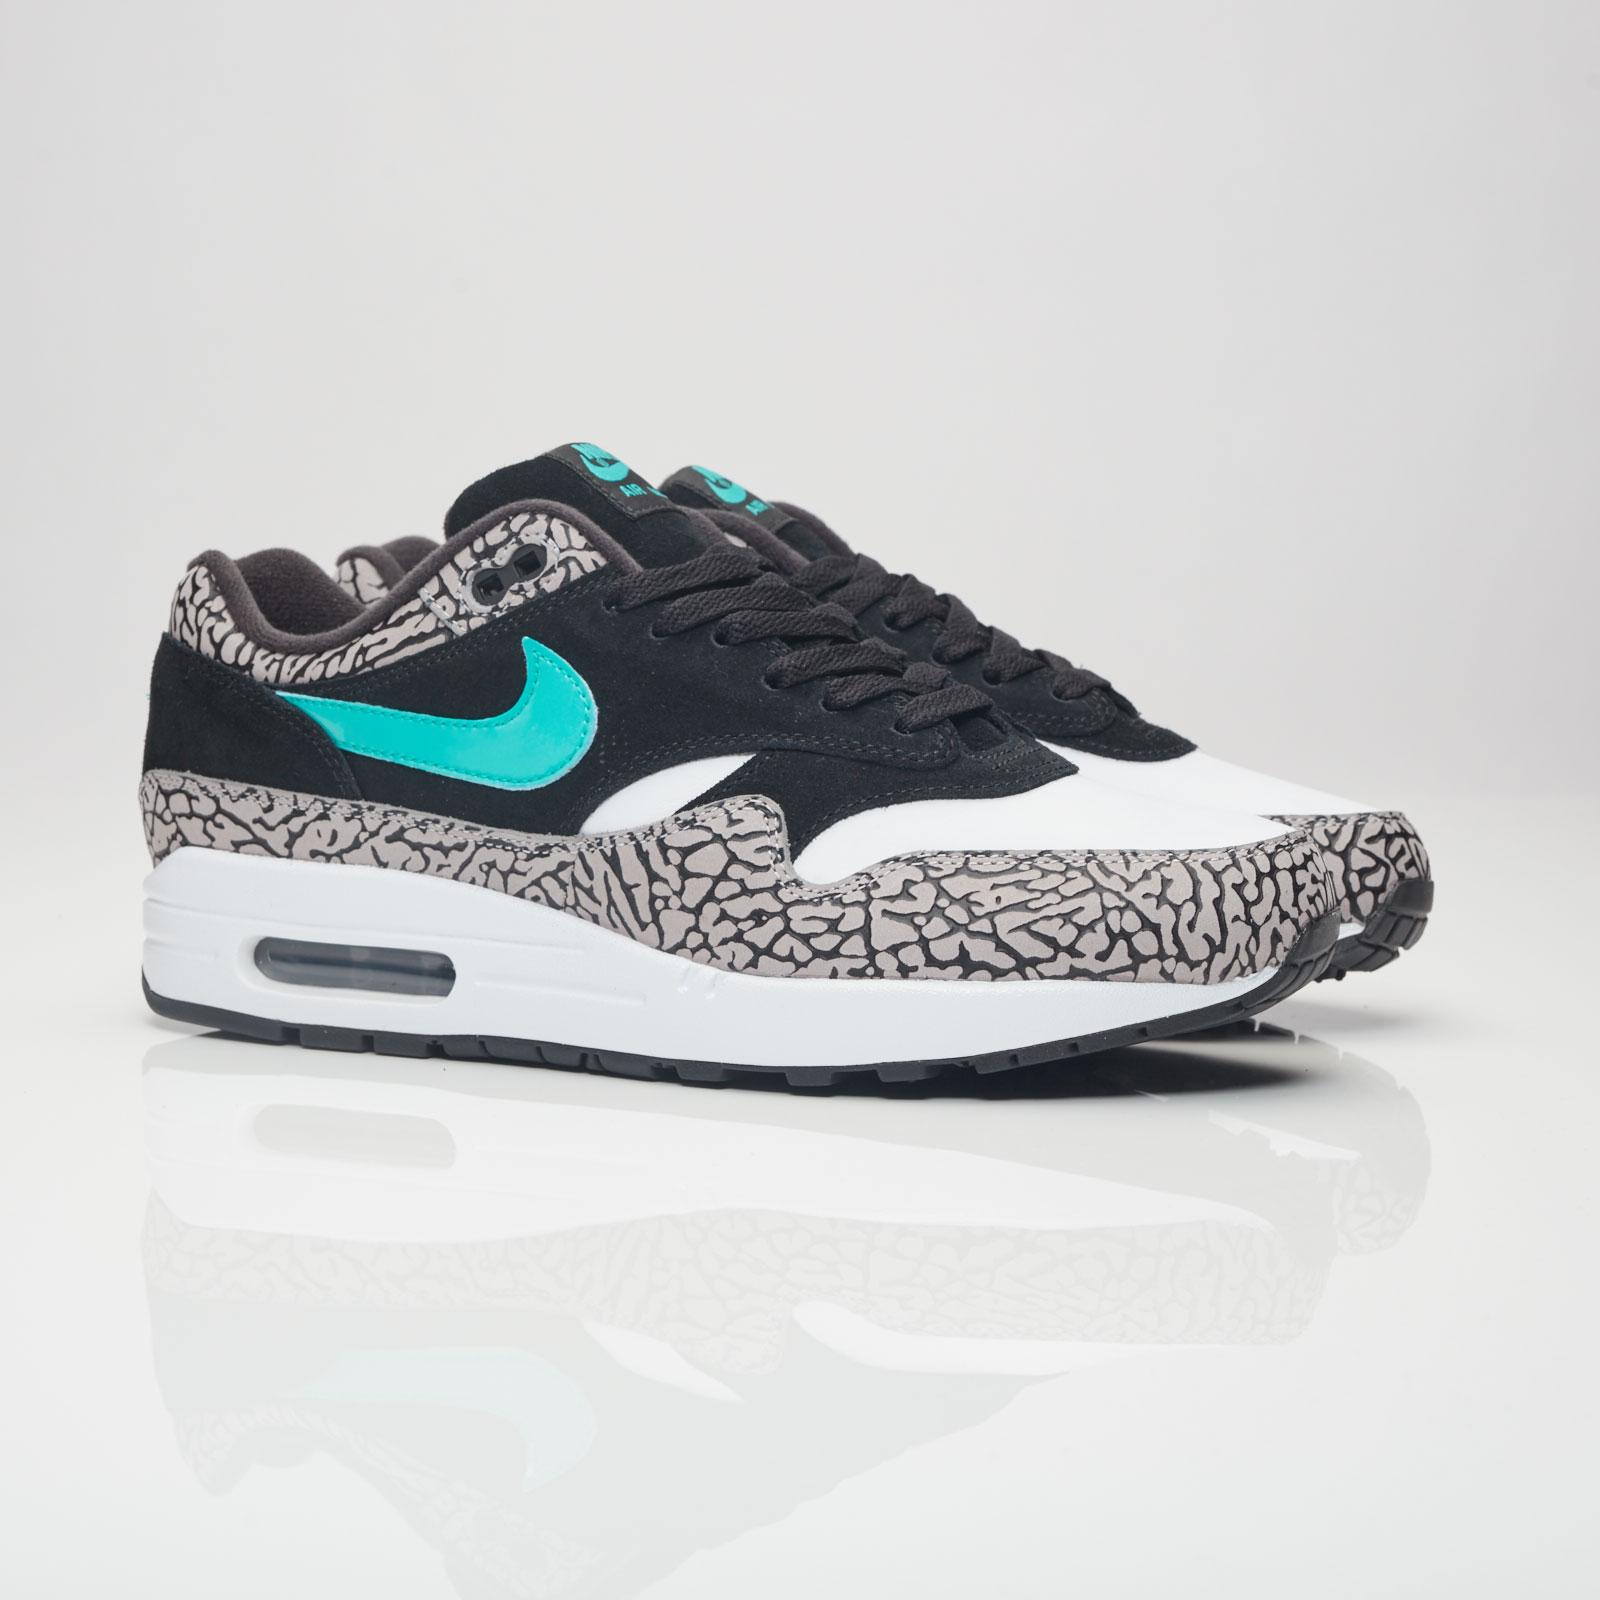 best website a7d99 13df5 Nike Sportswear Air Max 1 Premium Retro